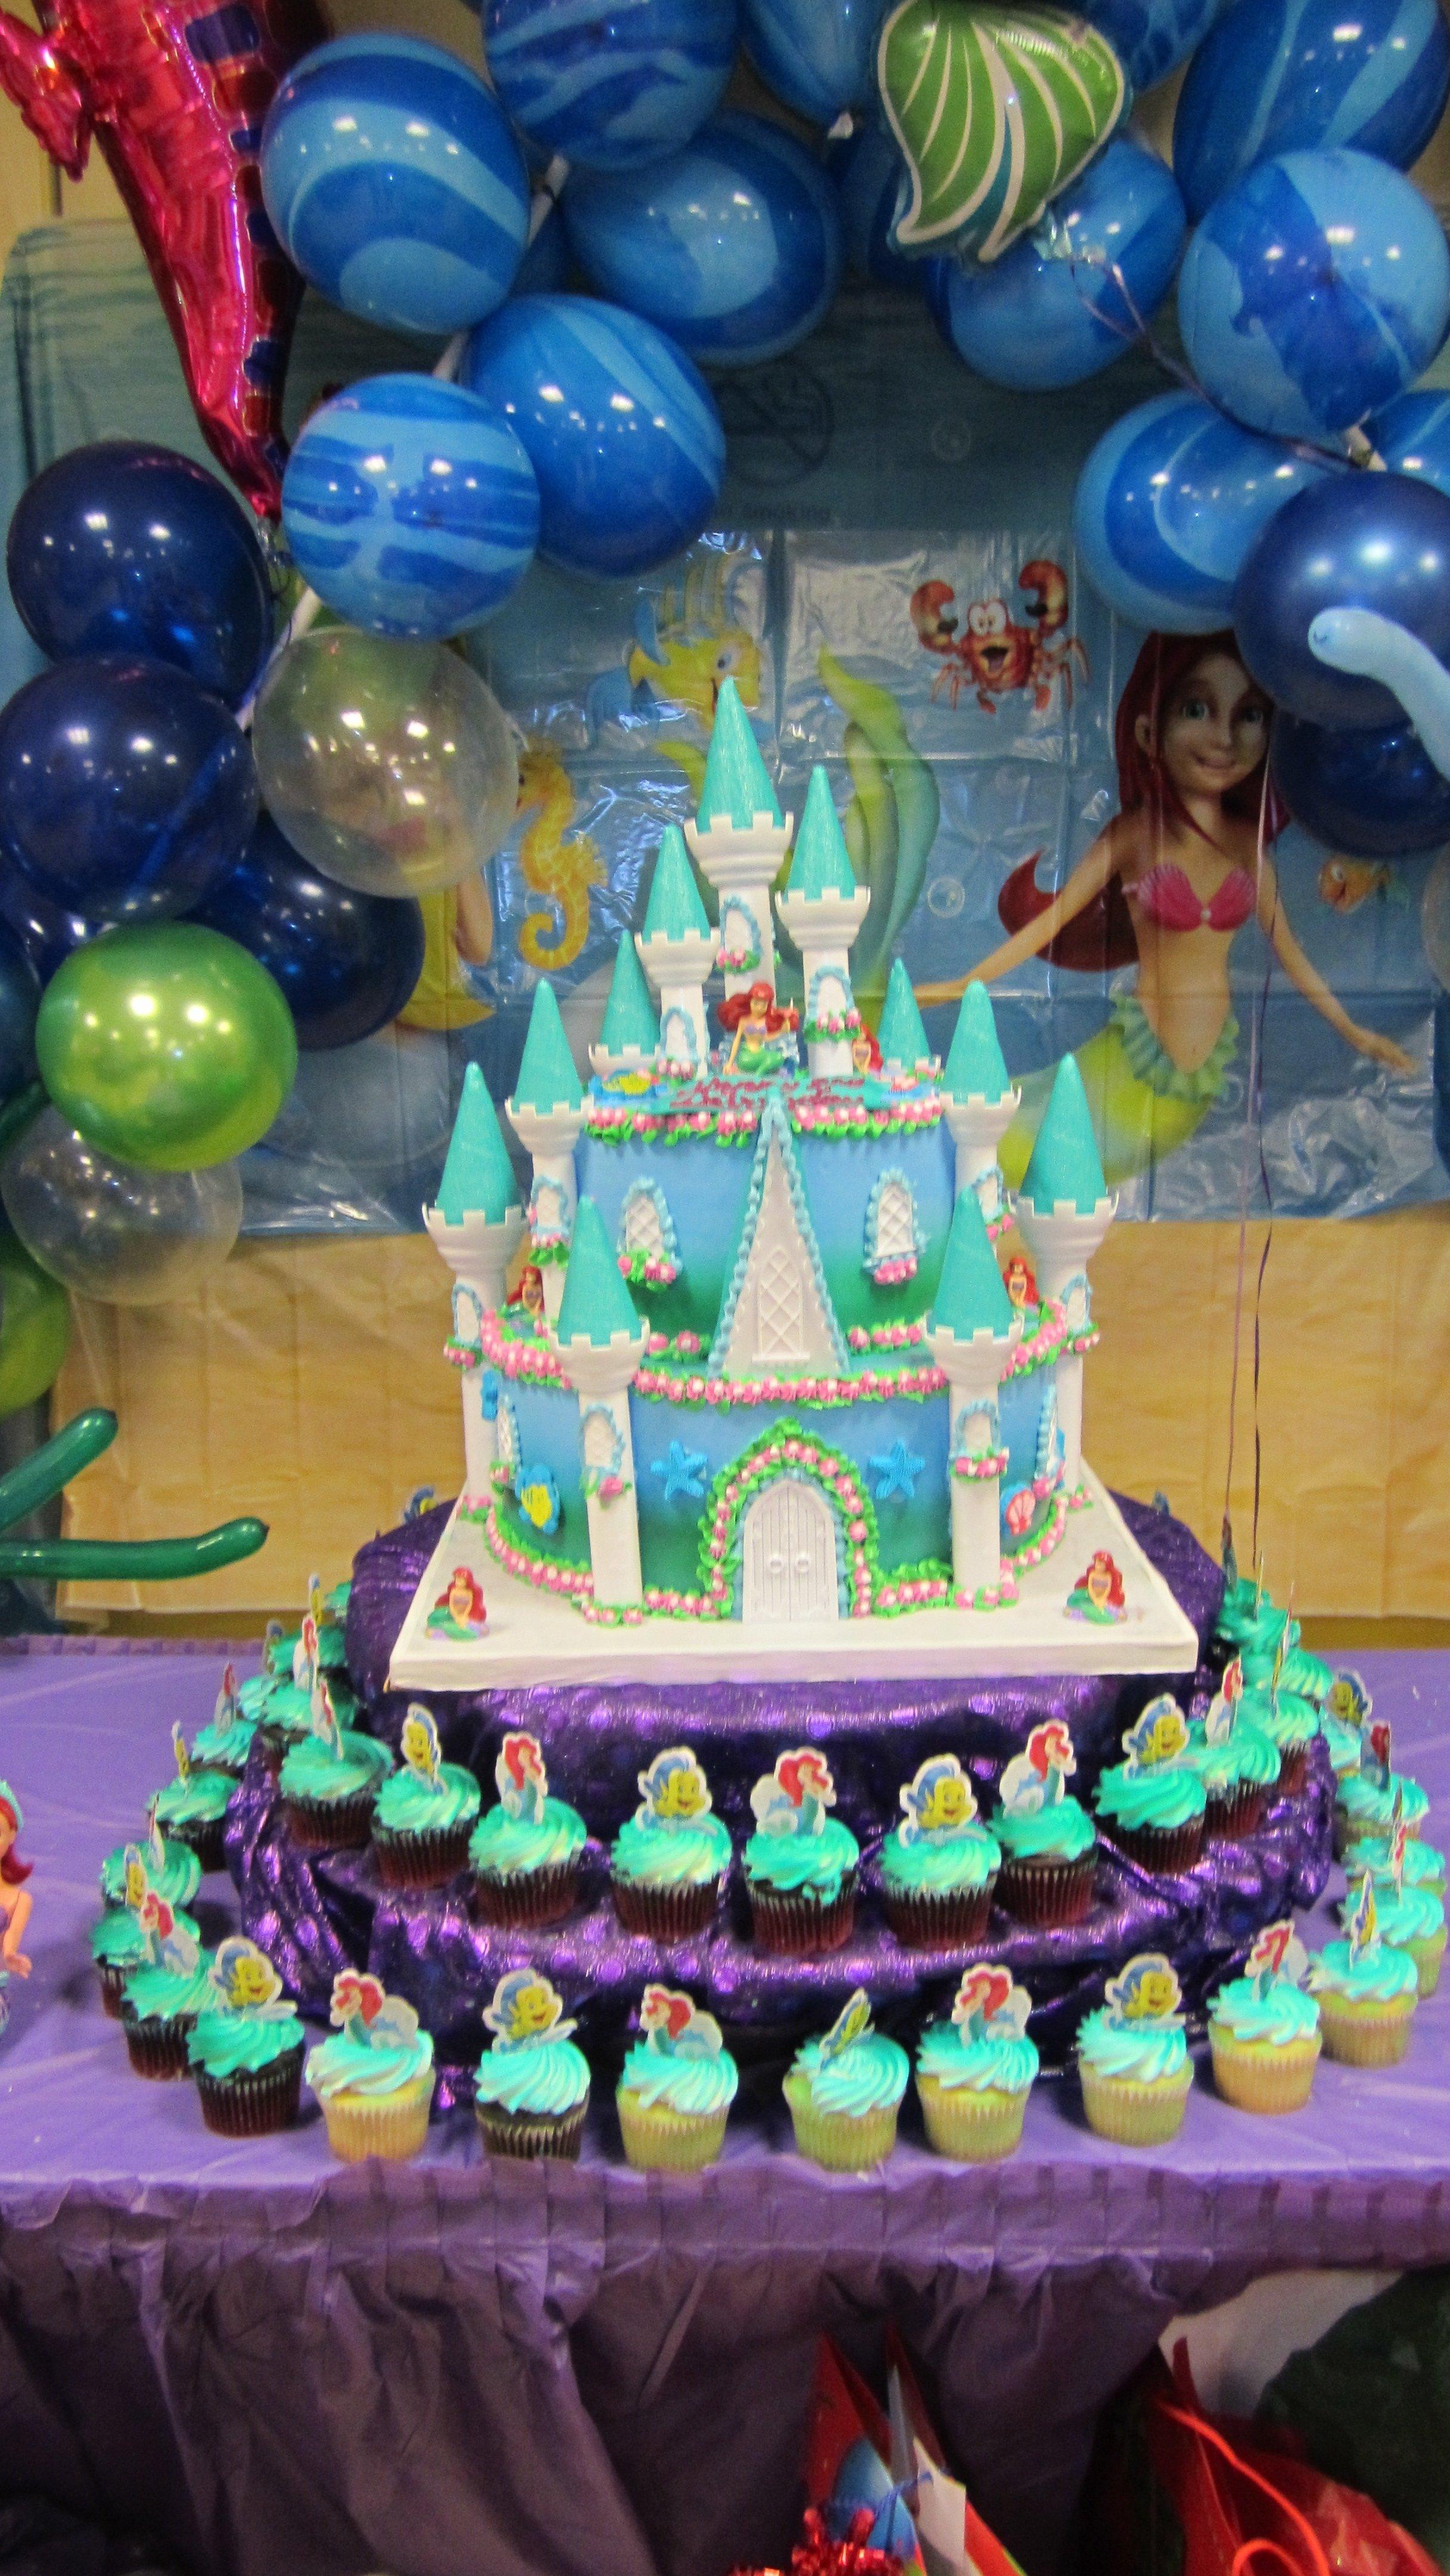 10 Great The Little Mermaid Birthday Party Ideas little mermaid birthday cake party decorations pinterest 2021